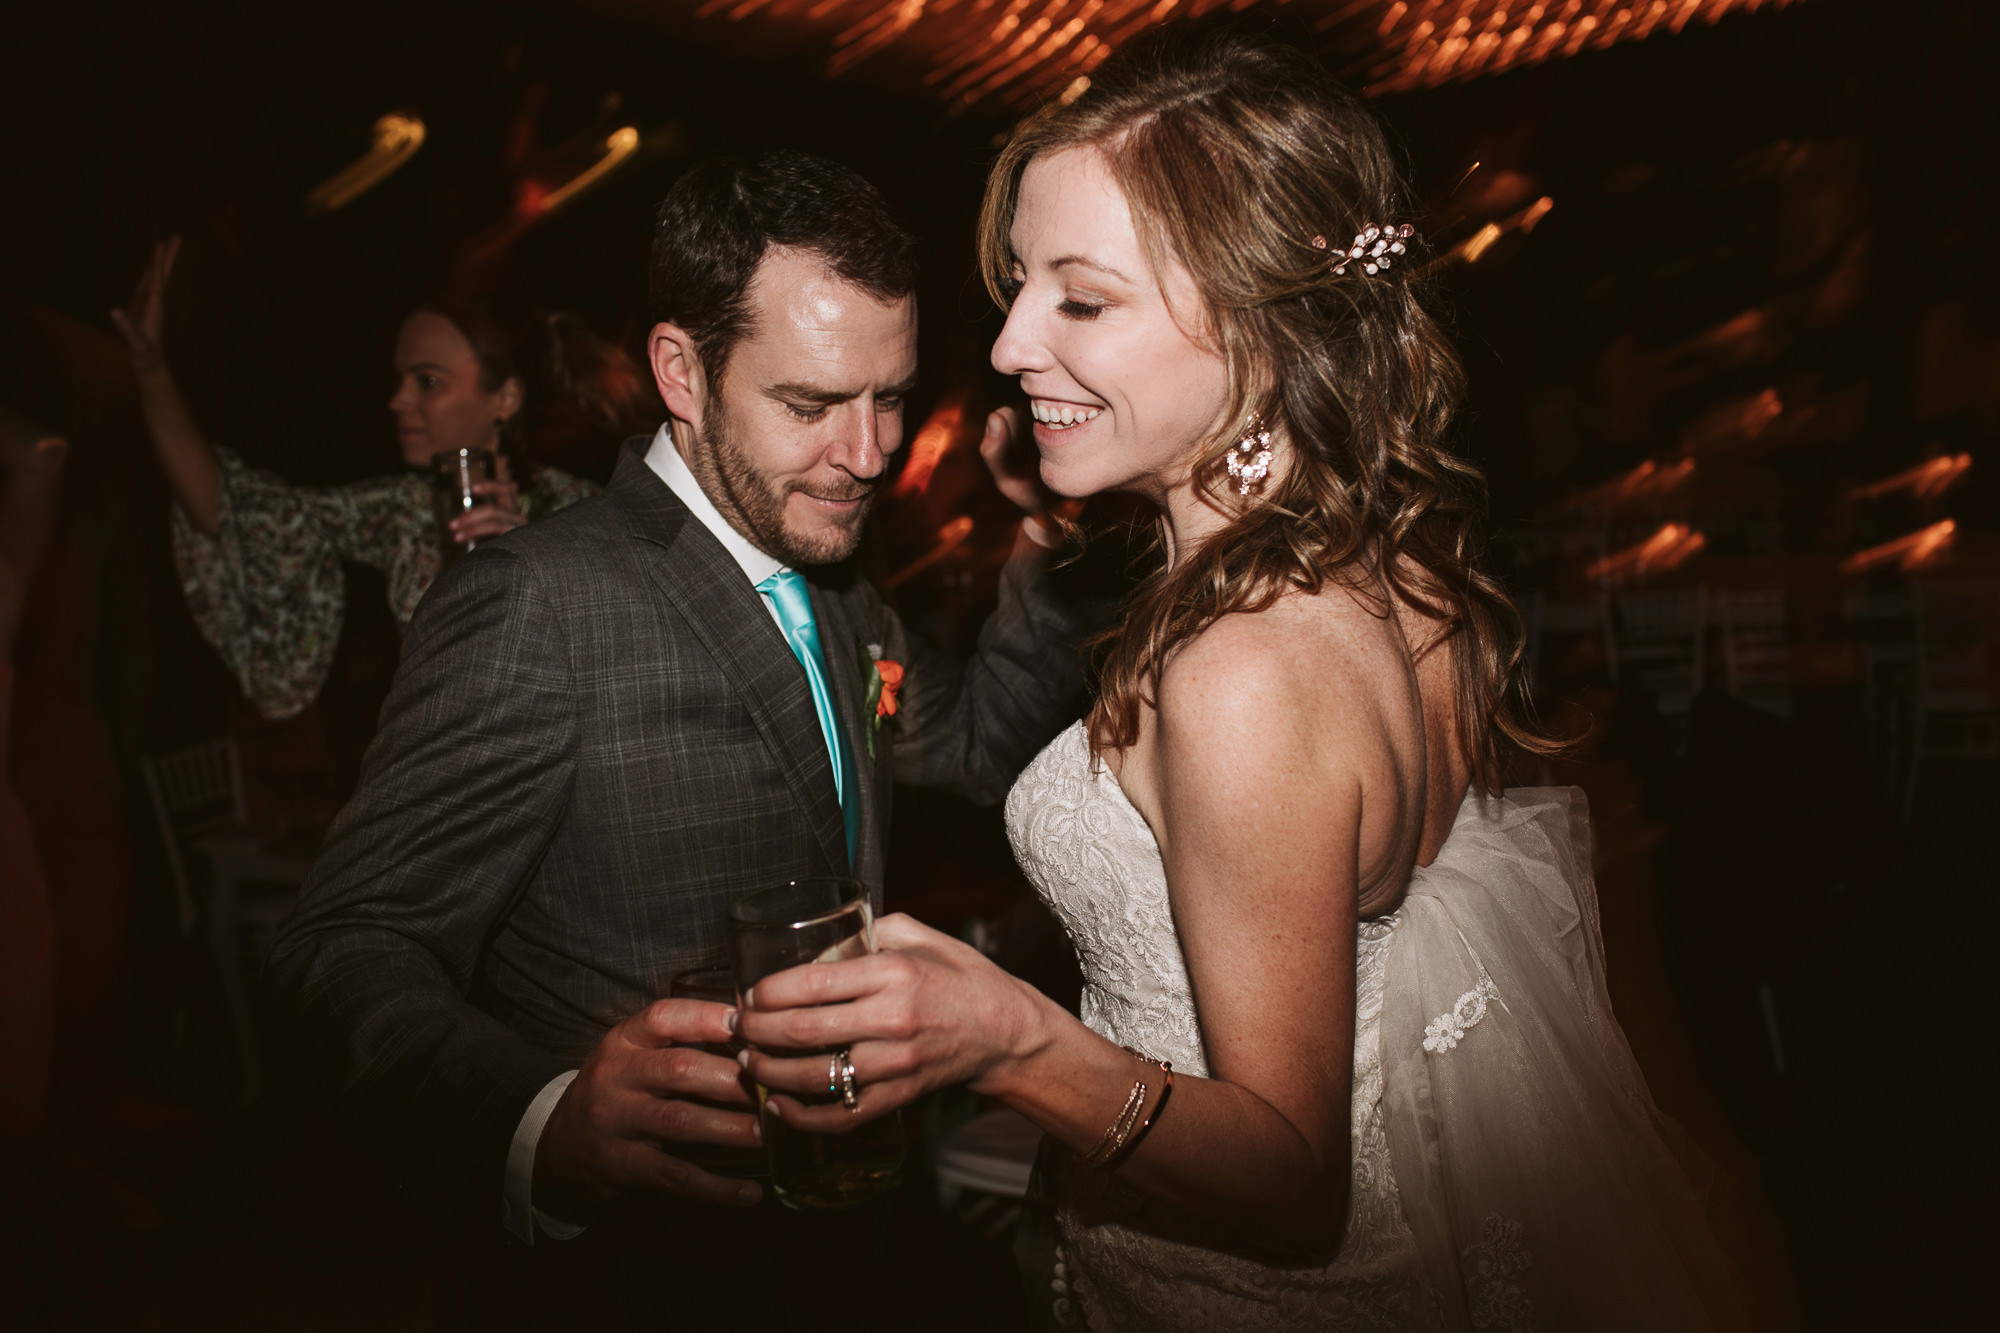 Destination-wedding-photographer-255.jpg